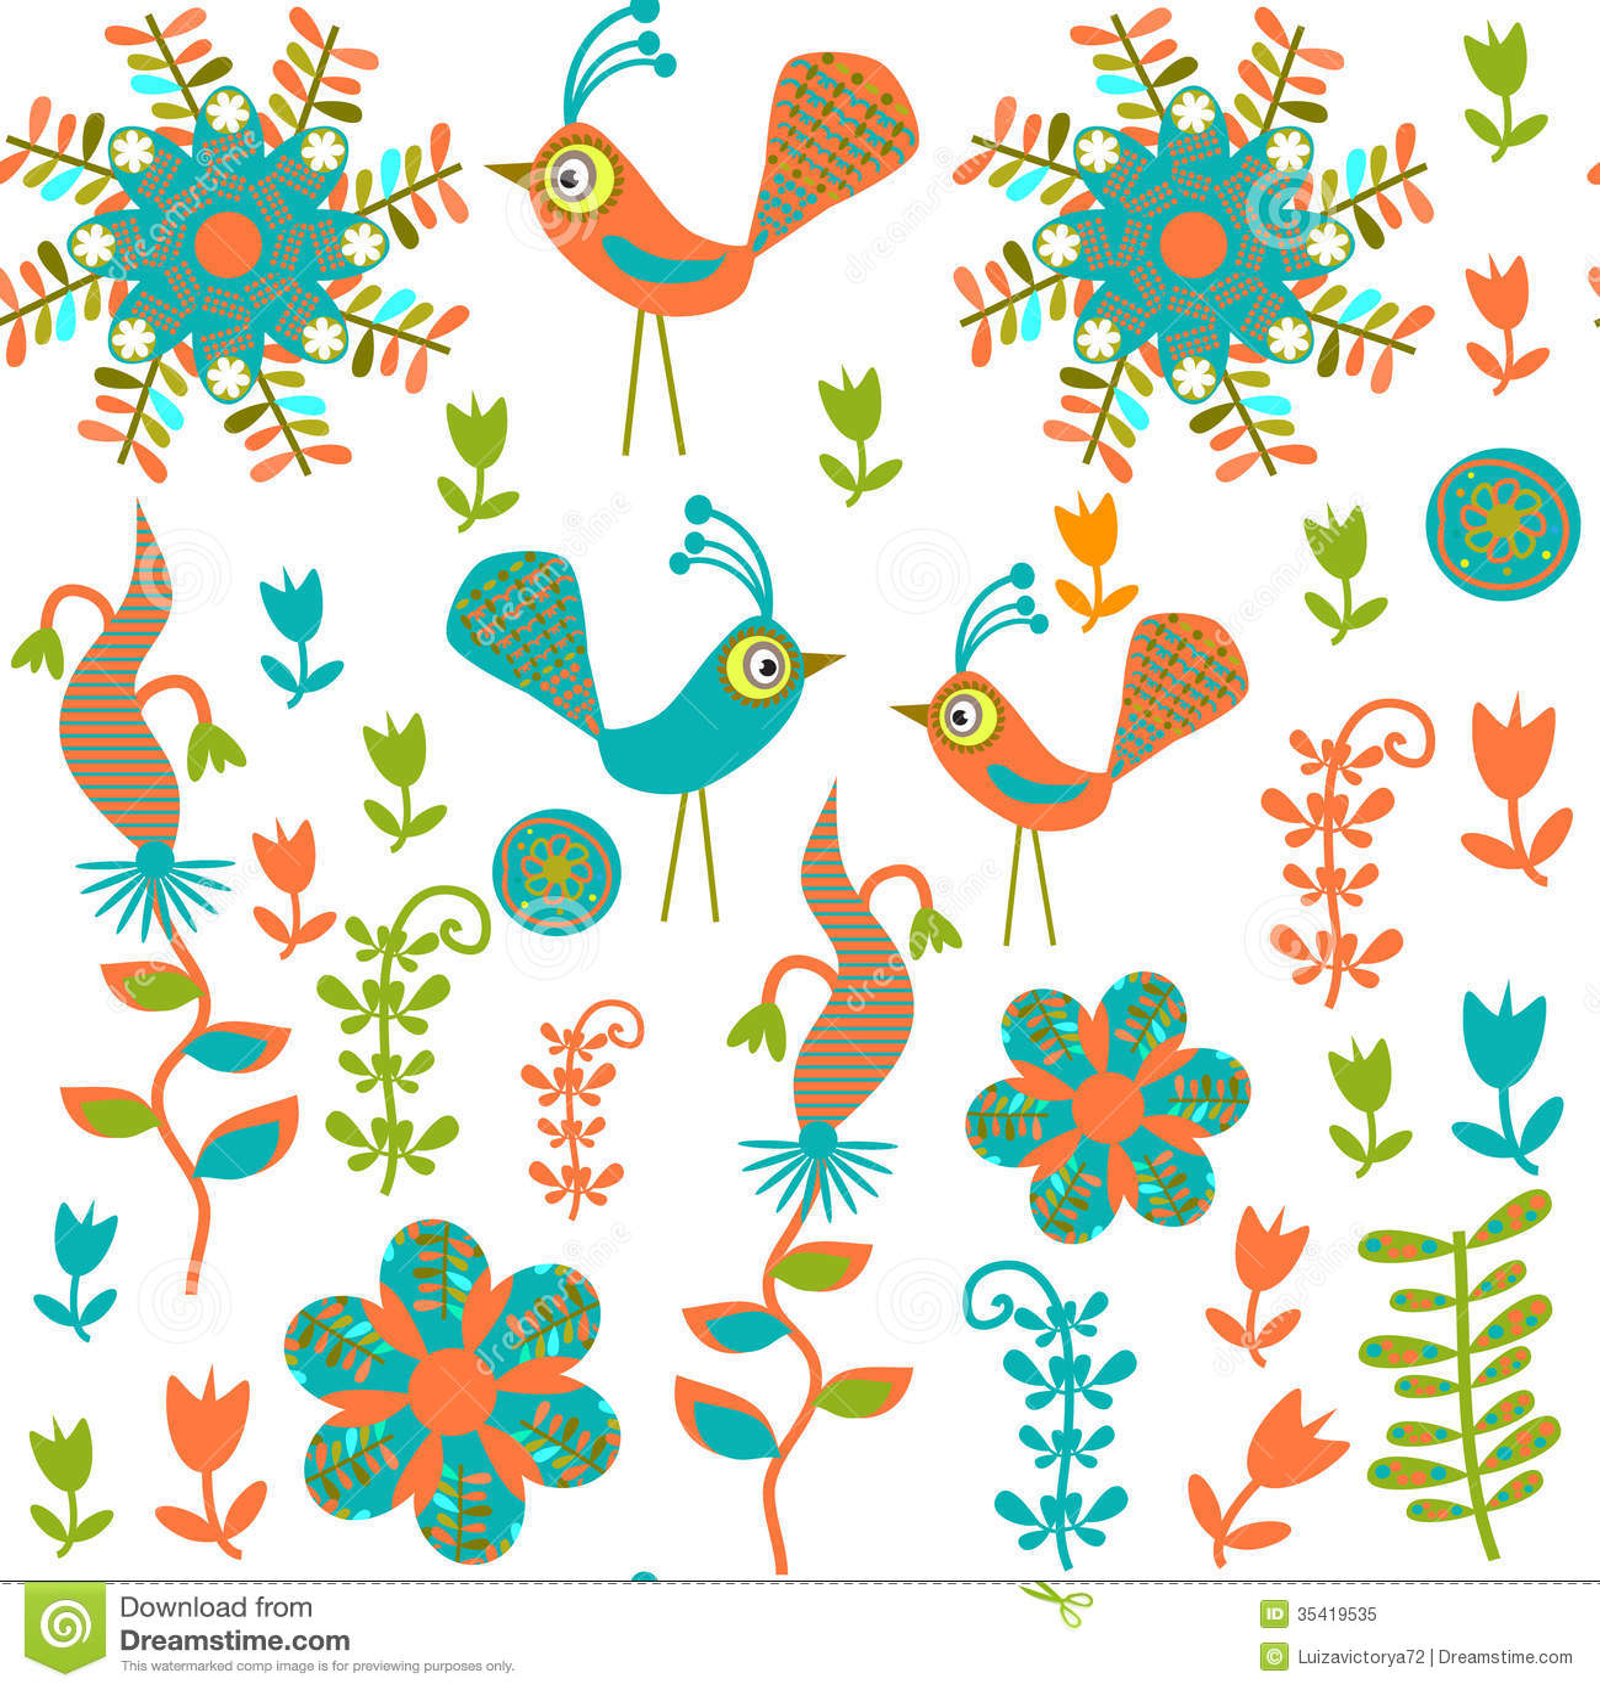 Cute Seamless Pattern With Cartoon Bird And Flower Stock